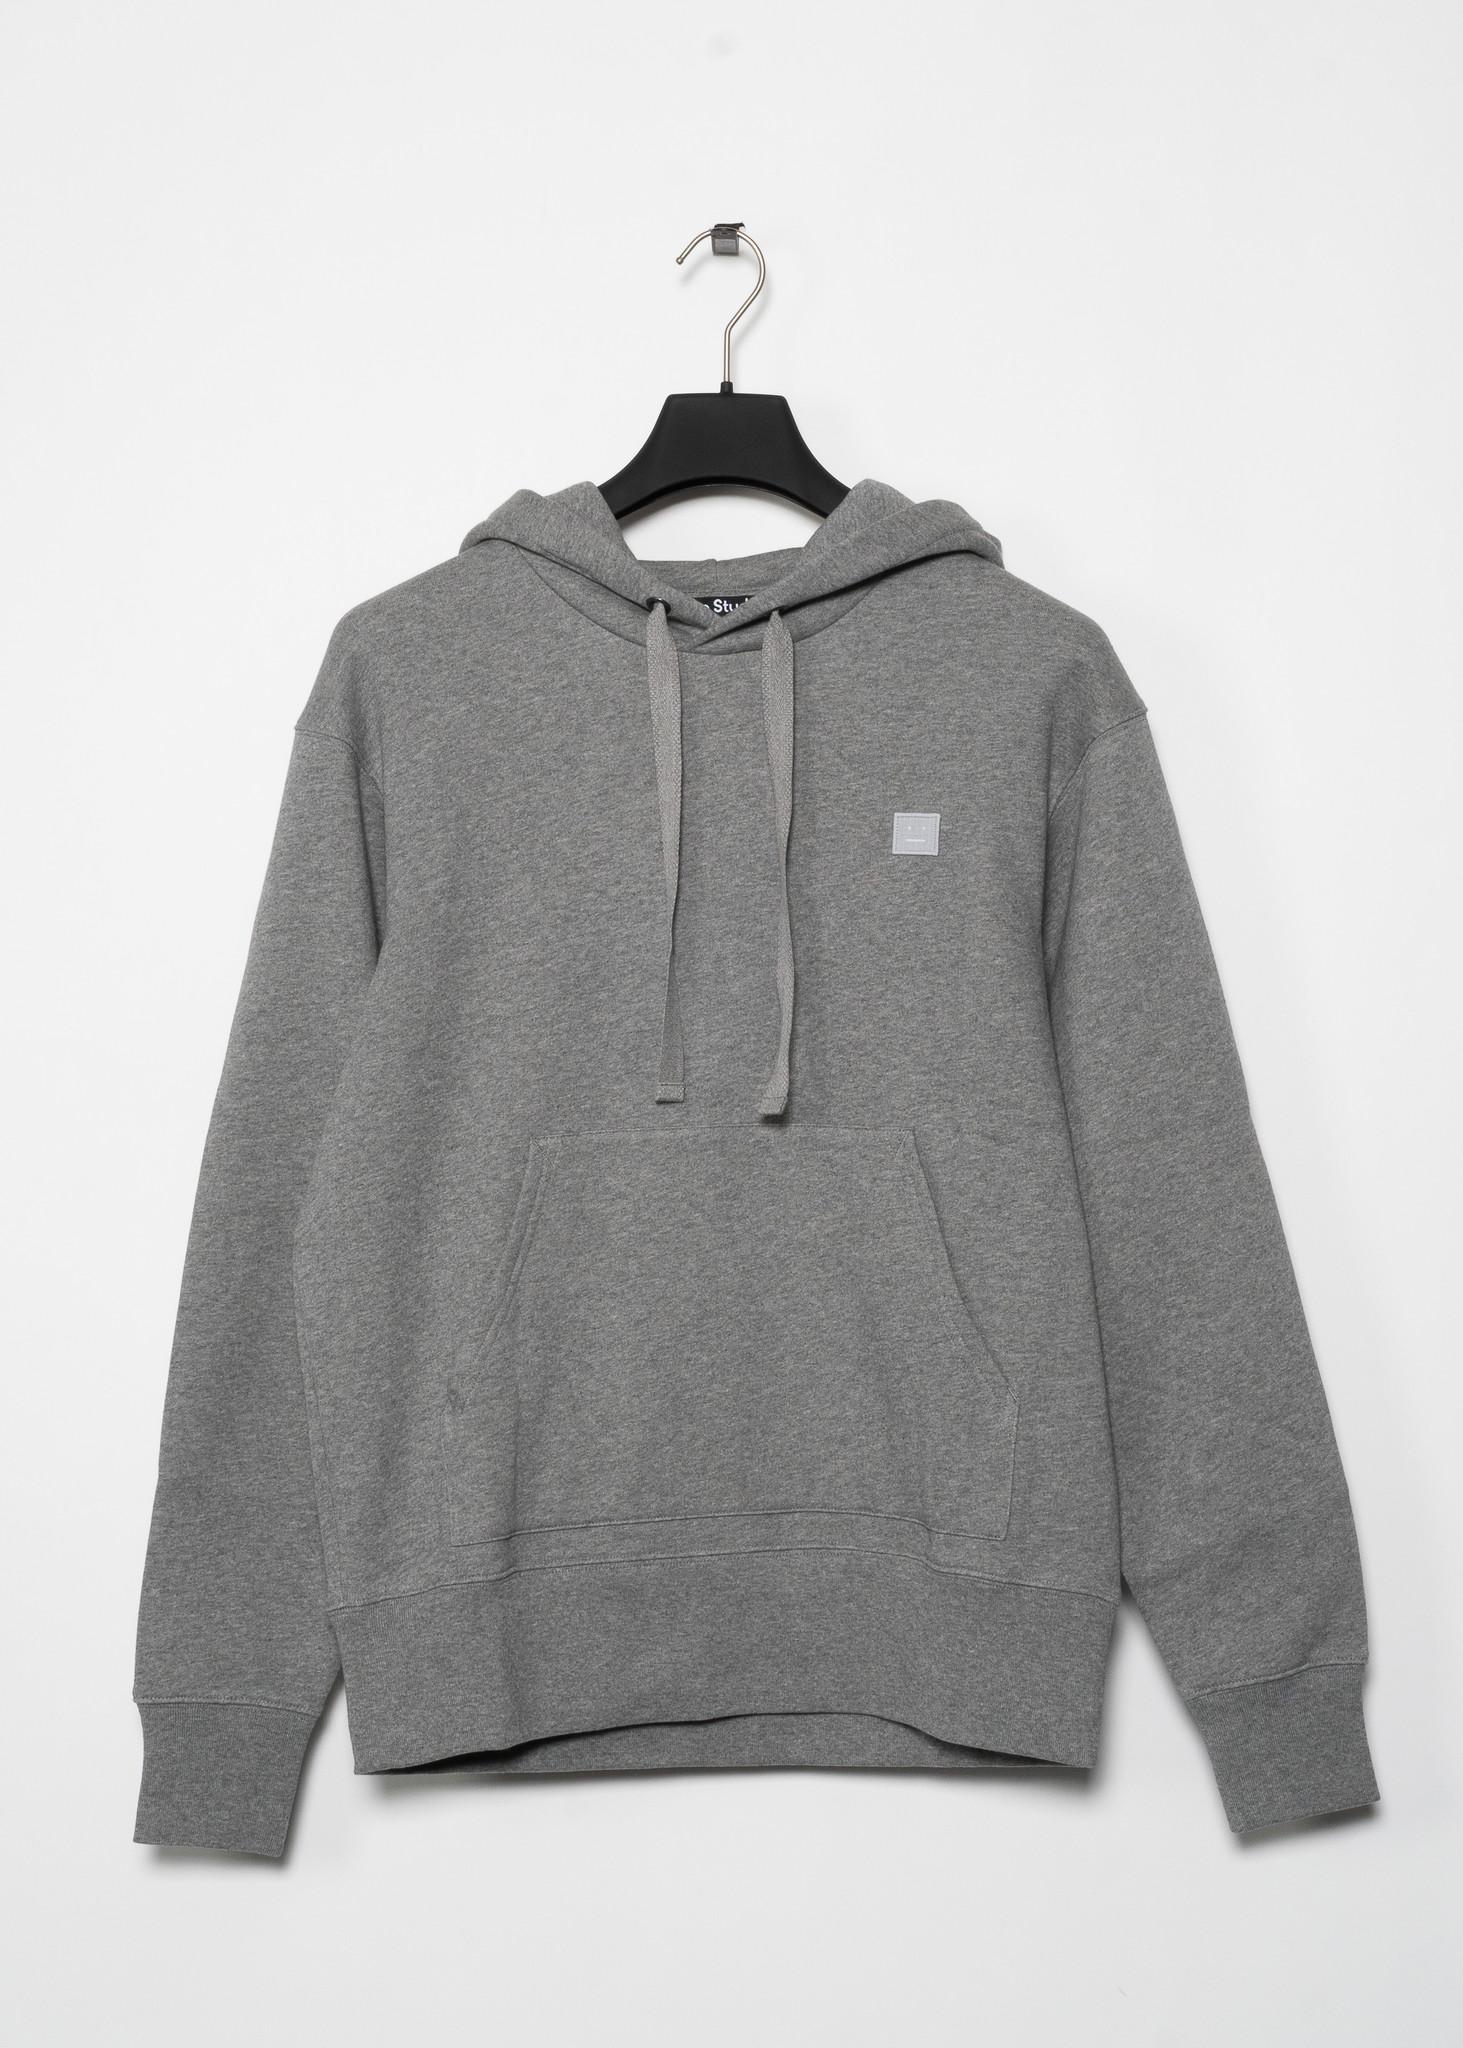 Grey Ferris Face Sweater